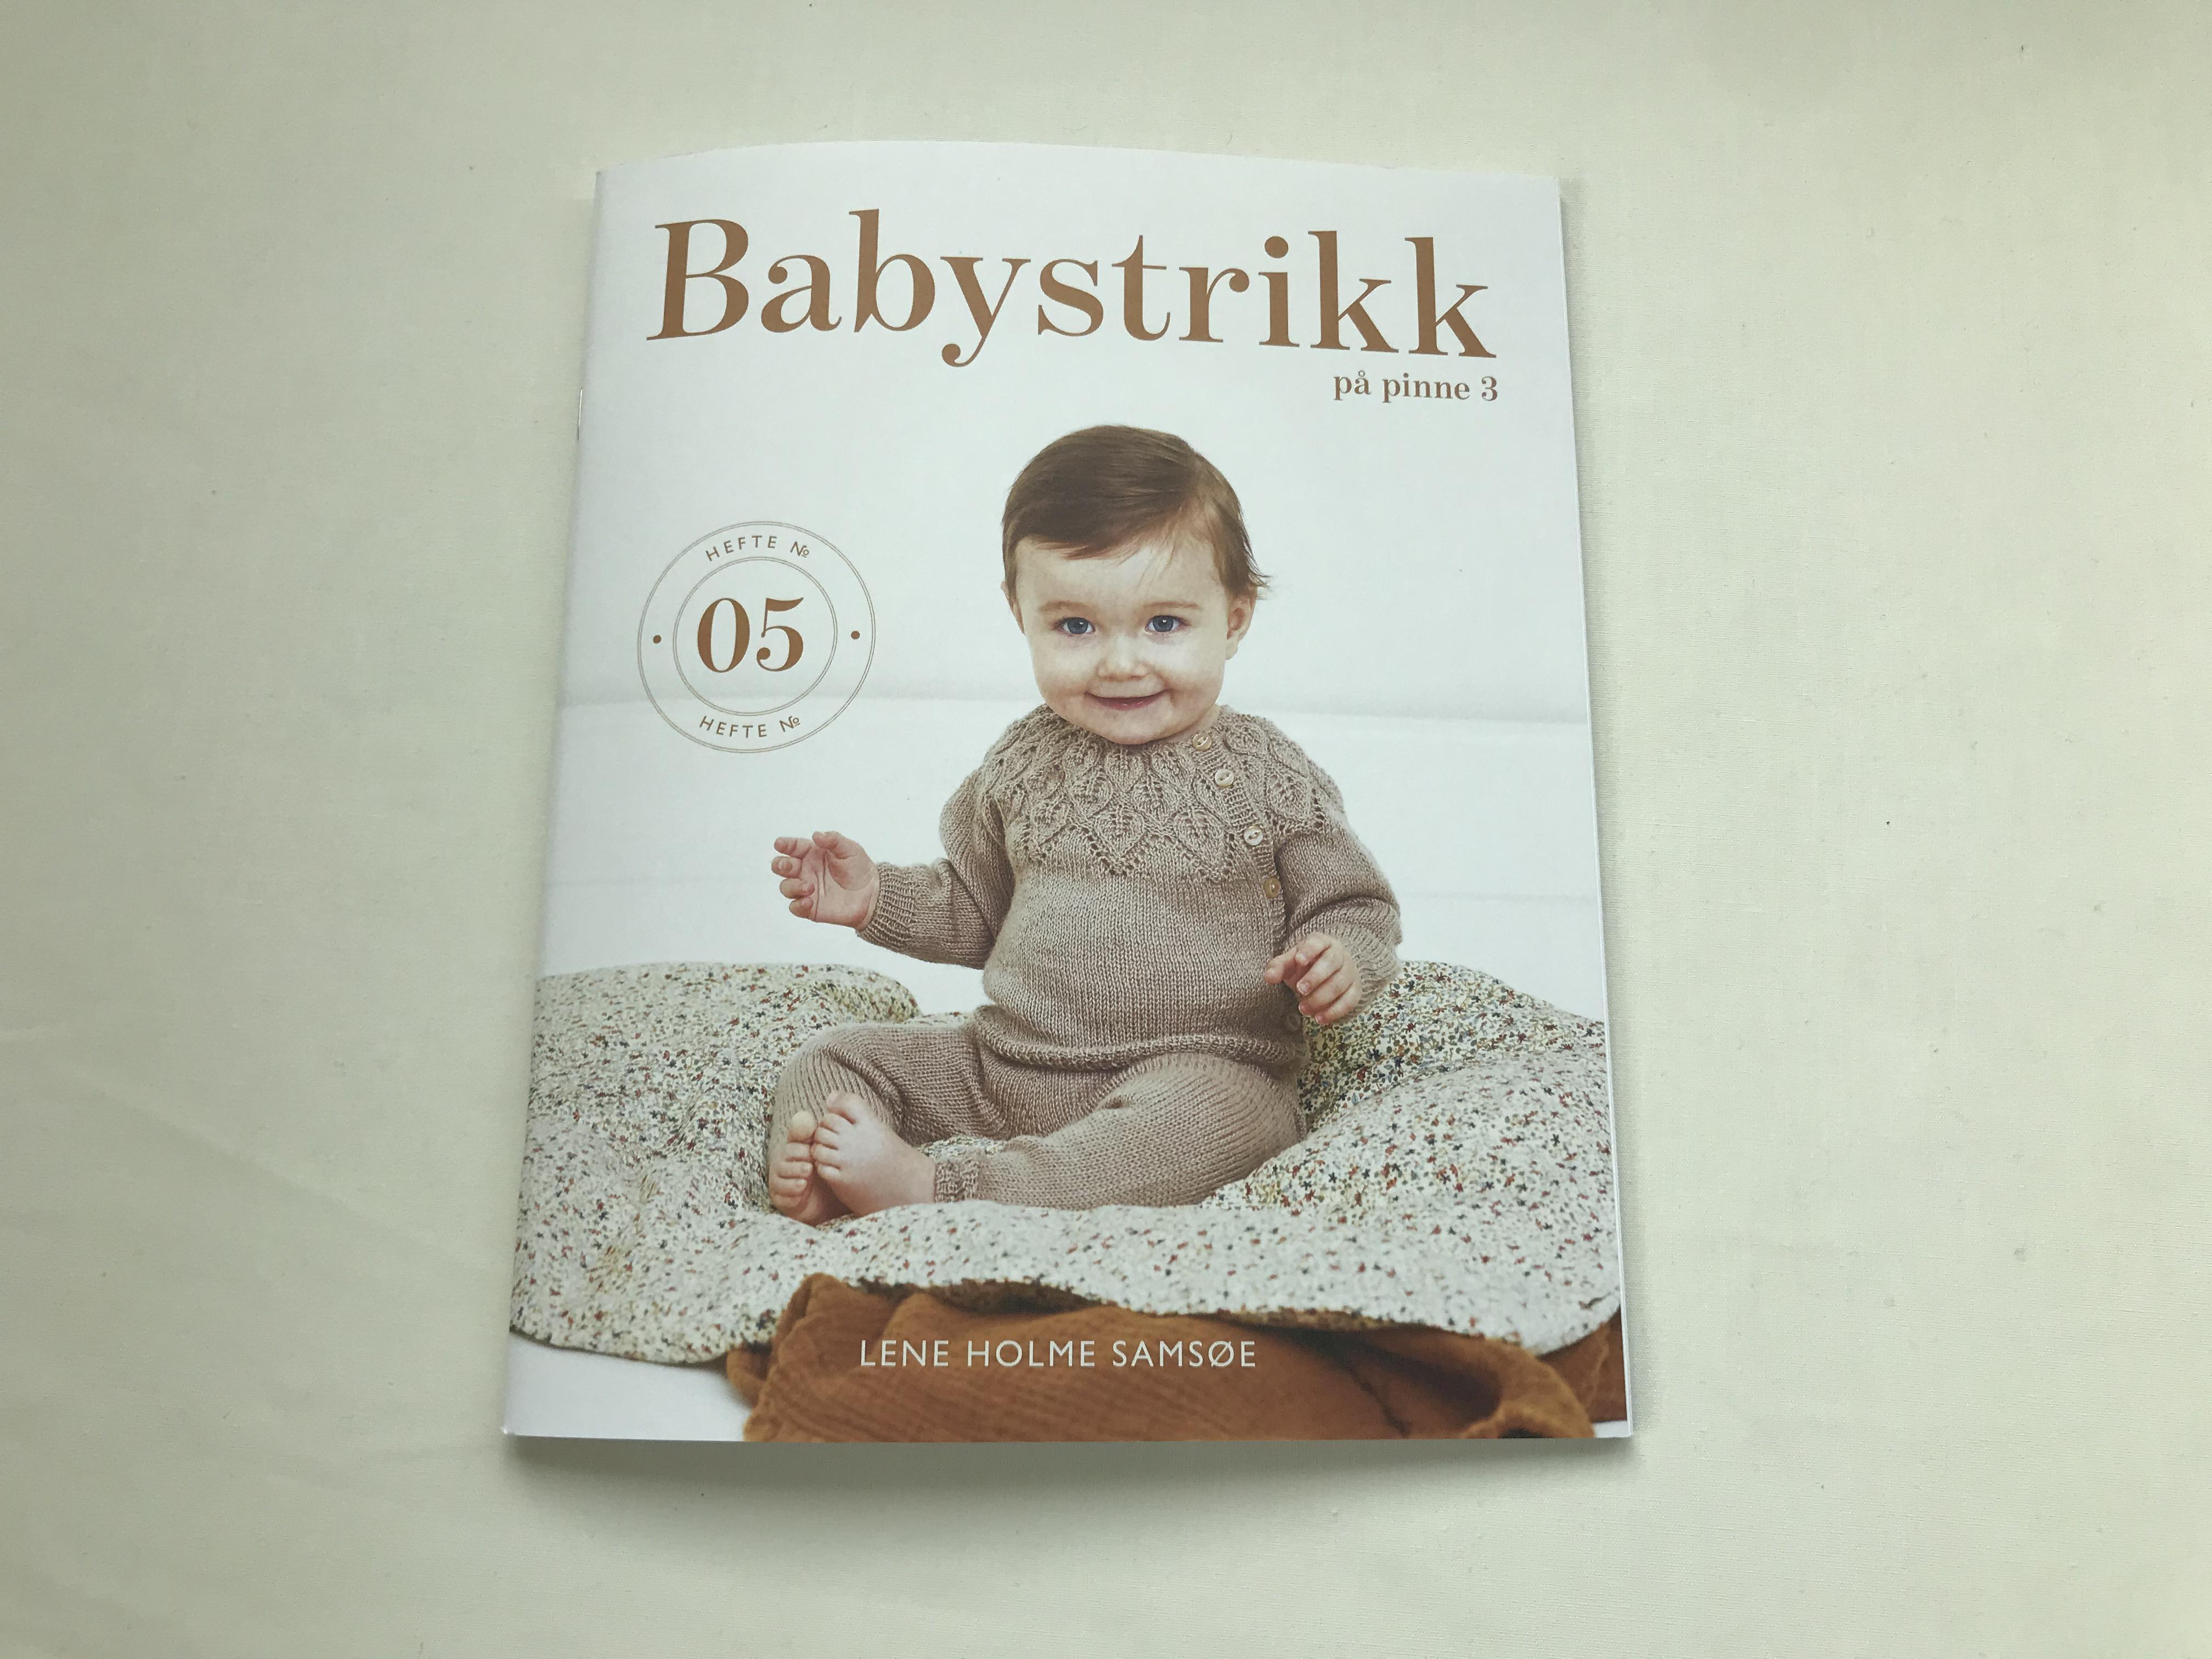 Hefte - Babystrikk på pinne 3 hefte no 5